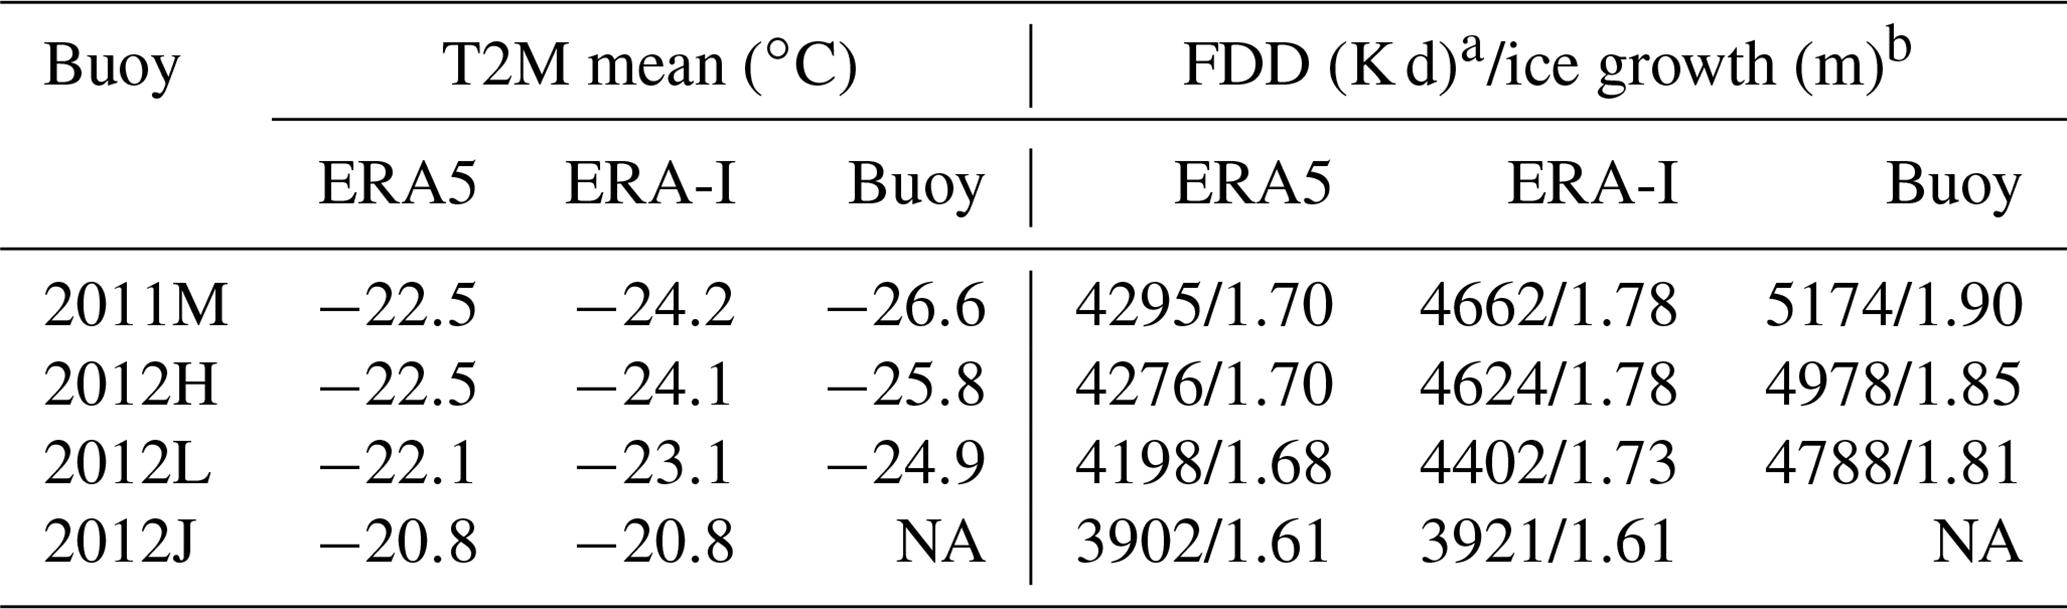 TC - Comparison of ERA5 and ERA-Interim near-surface air